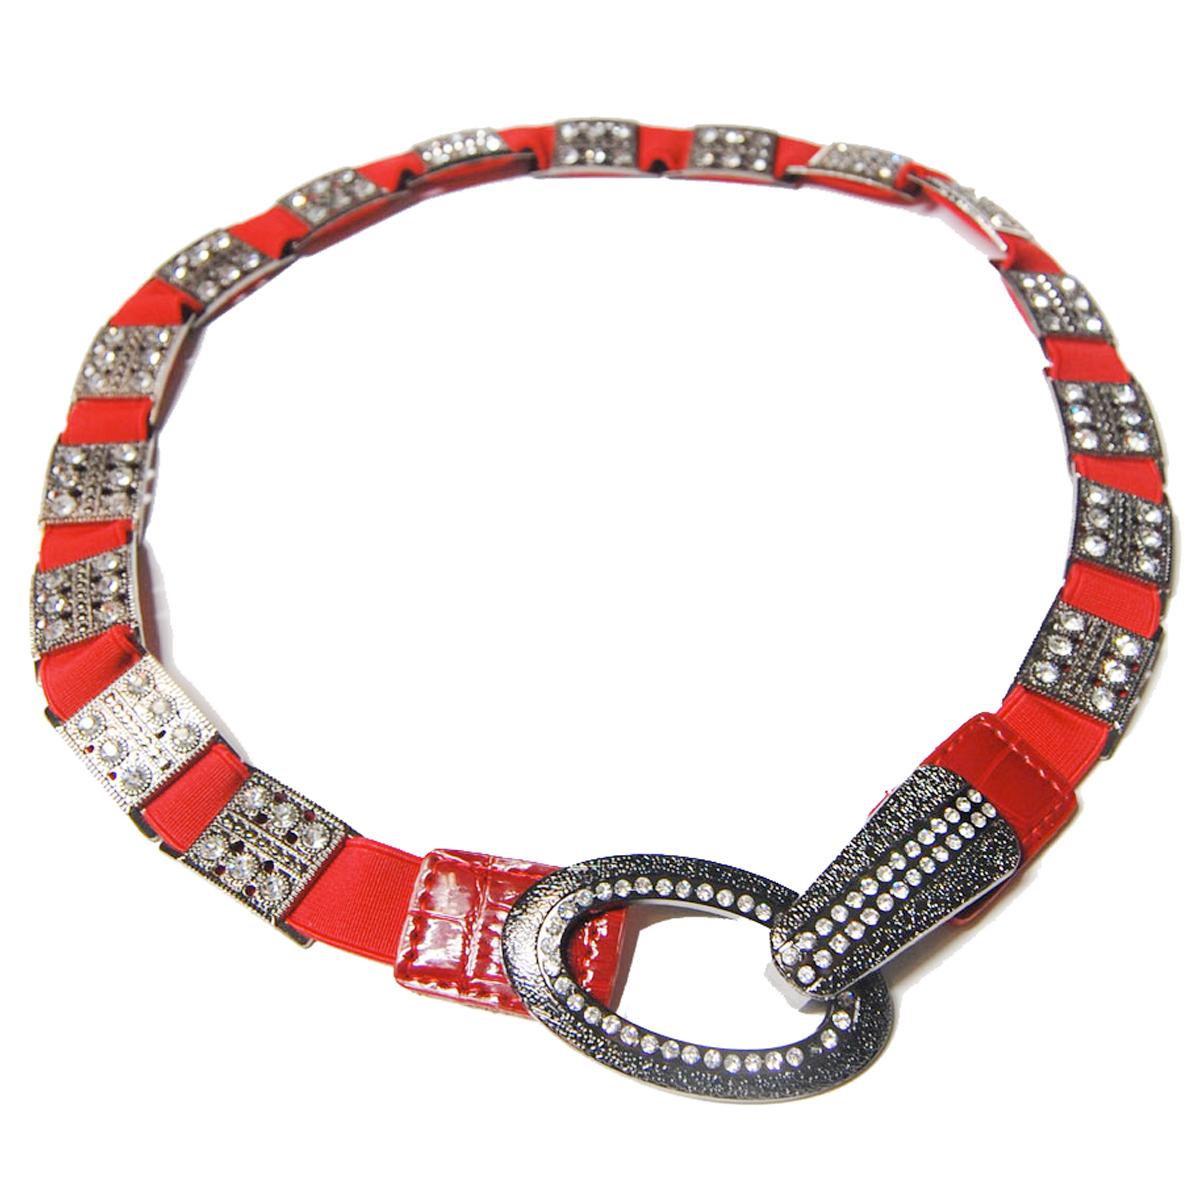 Crystal Stretch Belt - Red